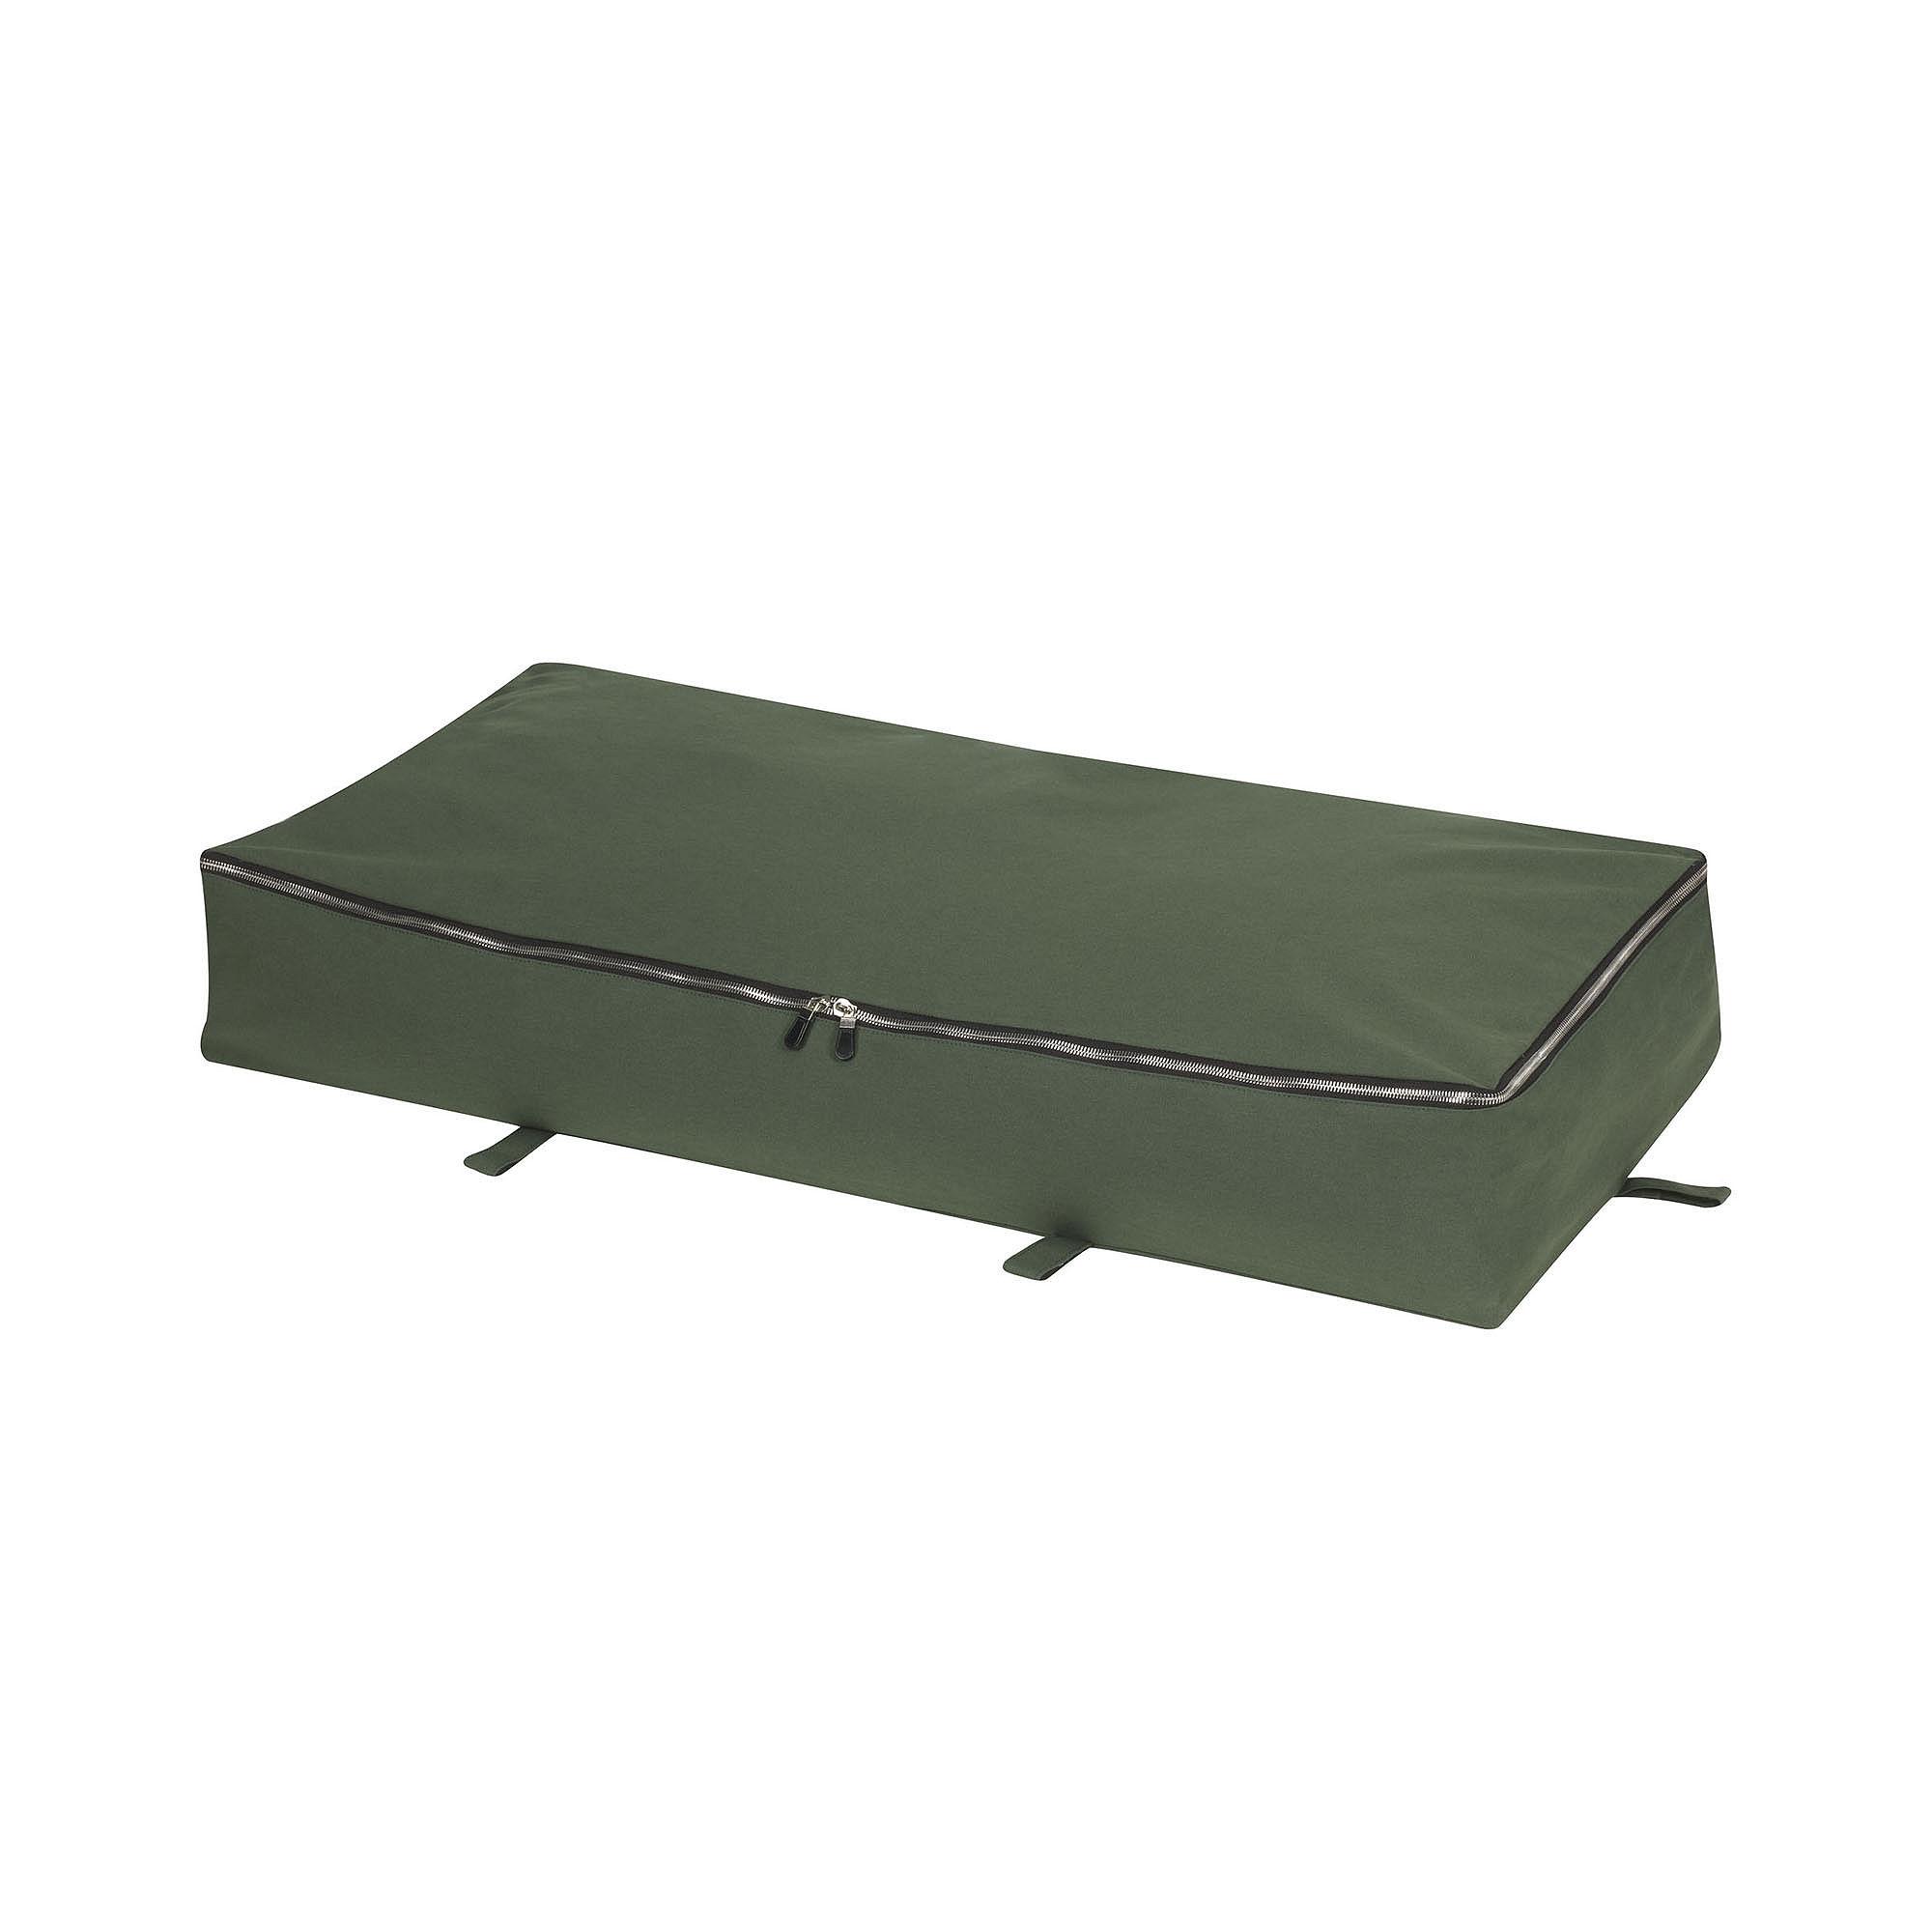 "Household Essentials CedarStow"" Sweater/Shelf Bag with Cedar Base"